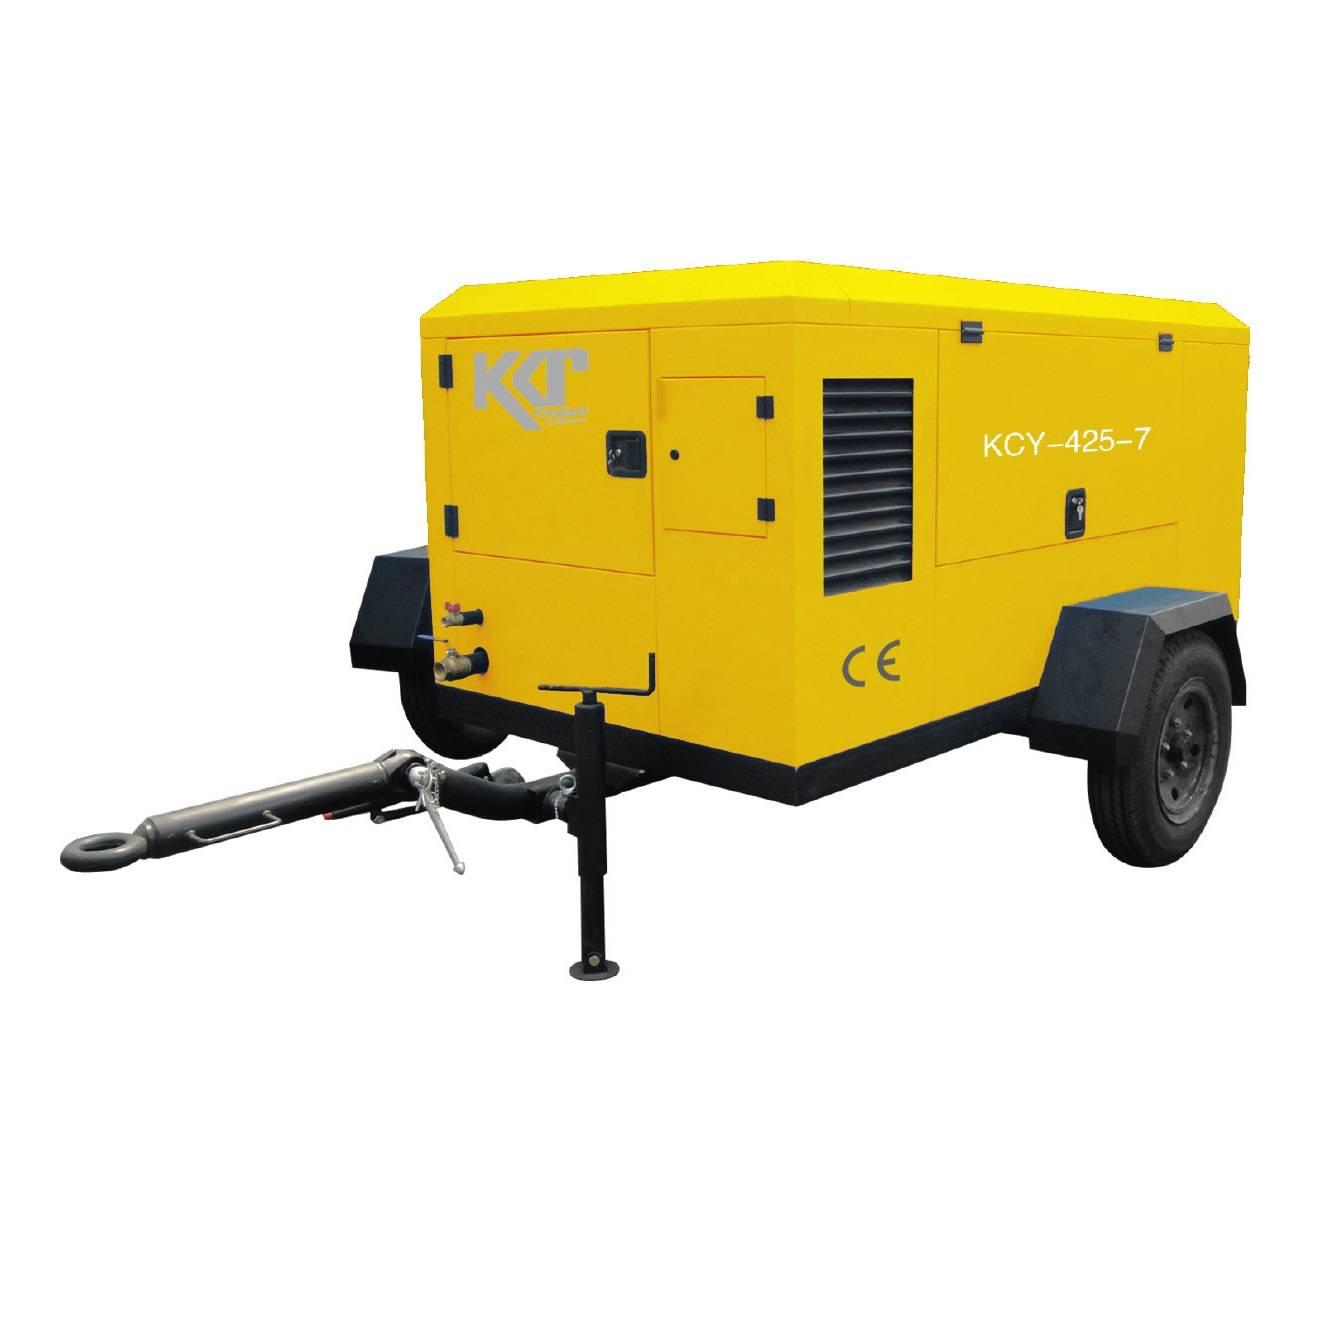 KCY425-7 portable rotary screw air compressor